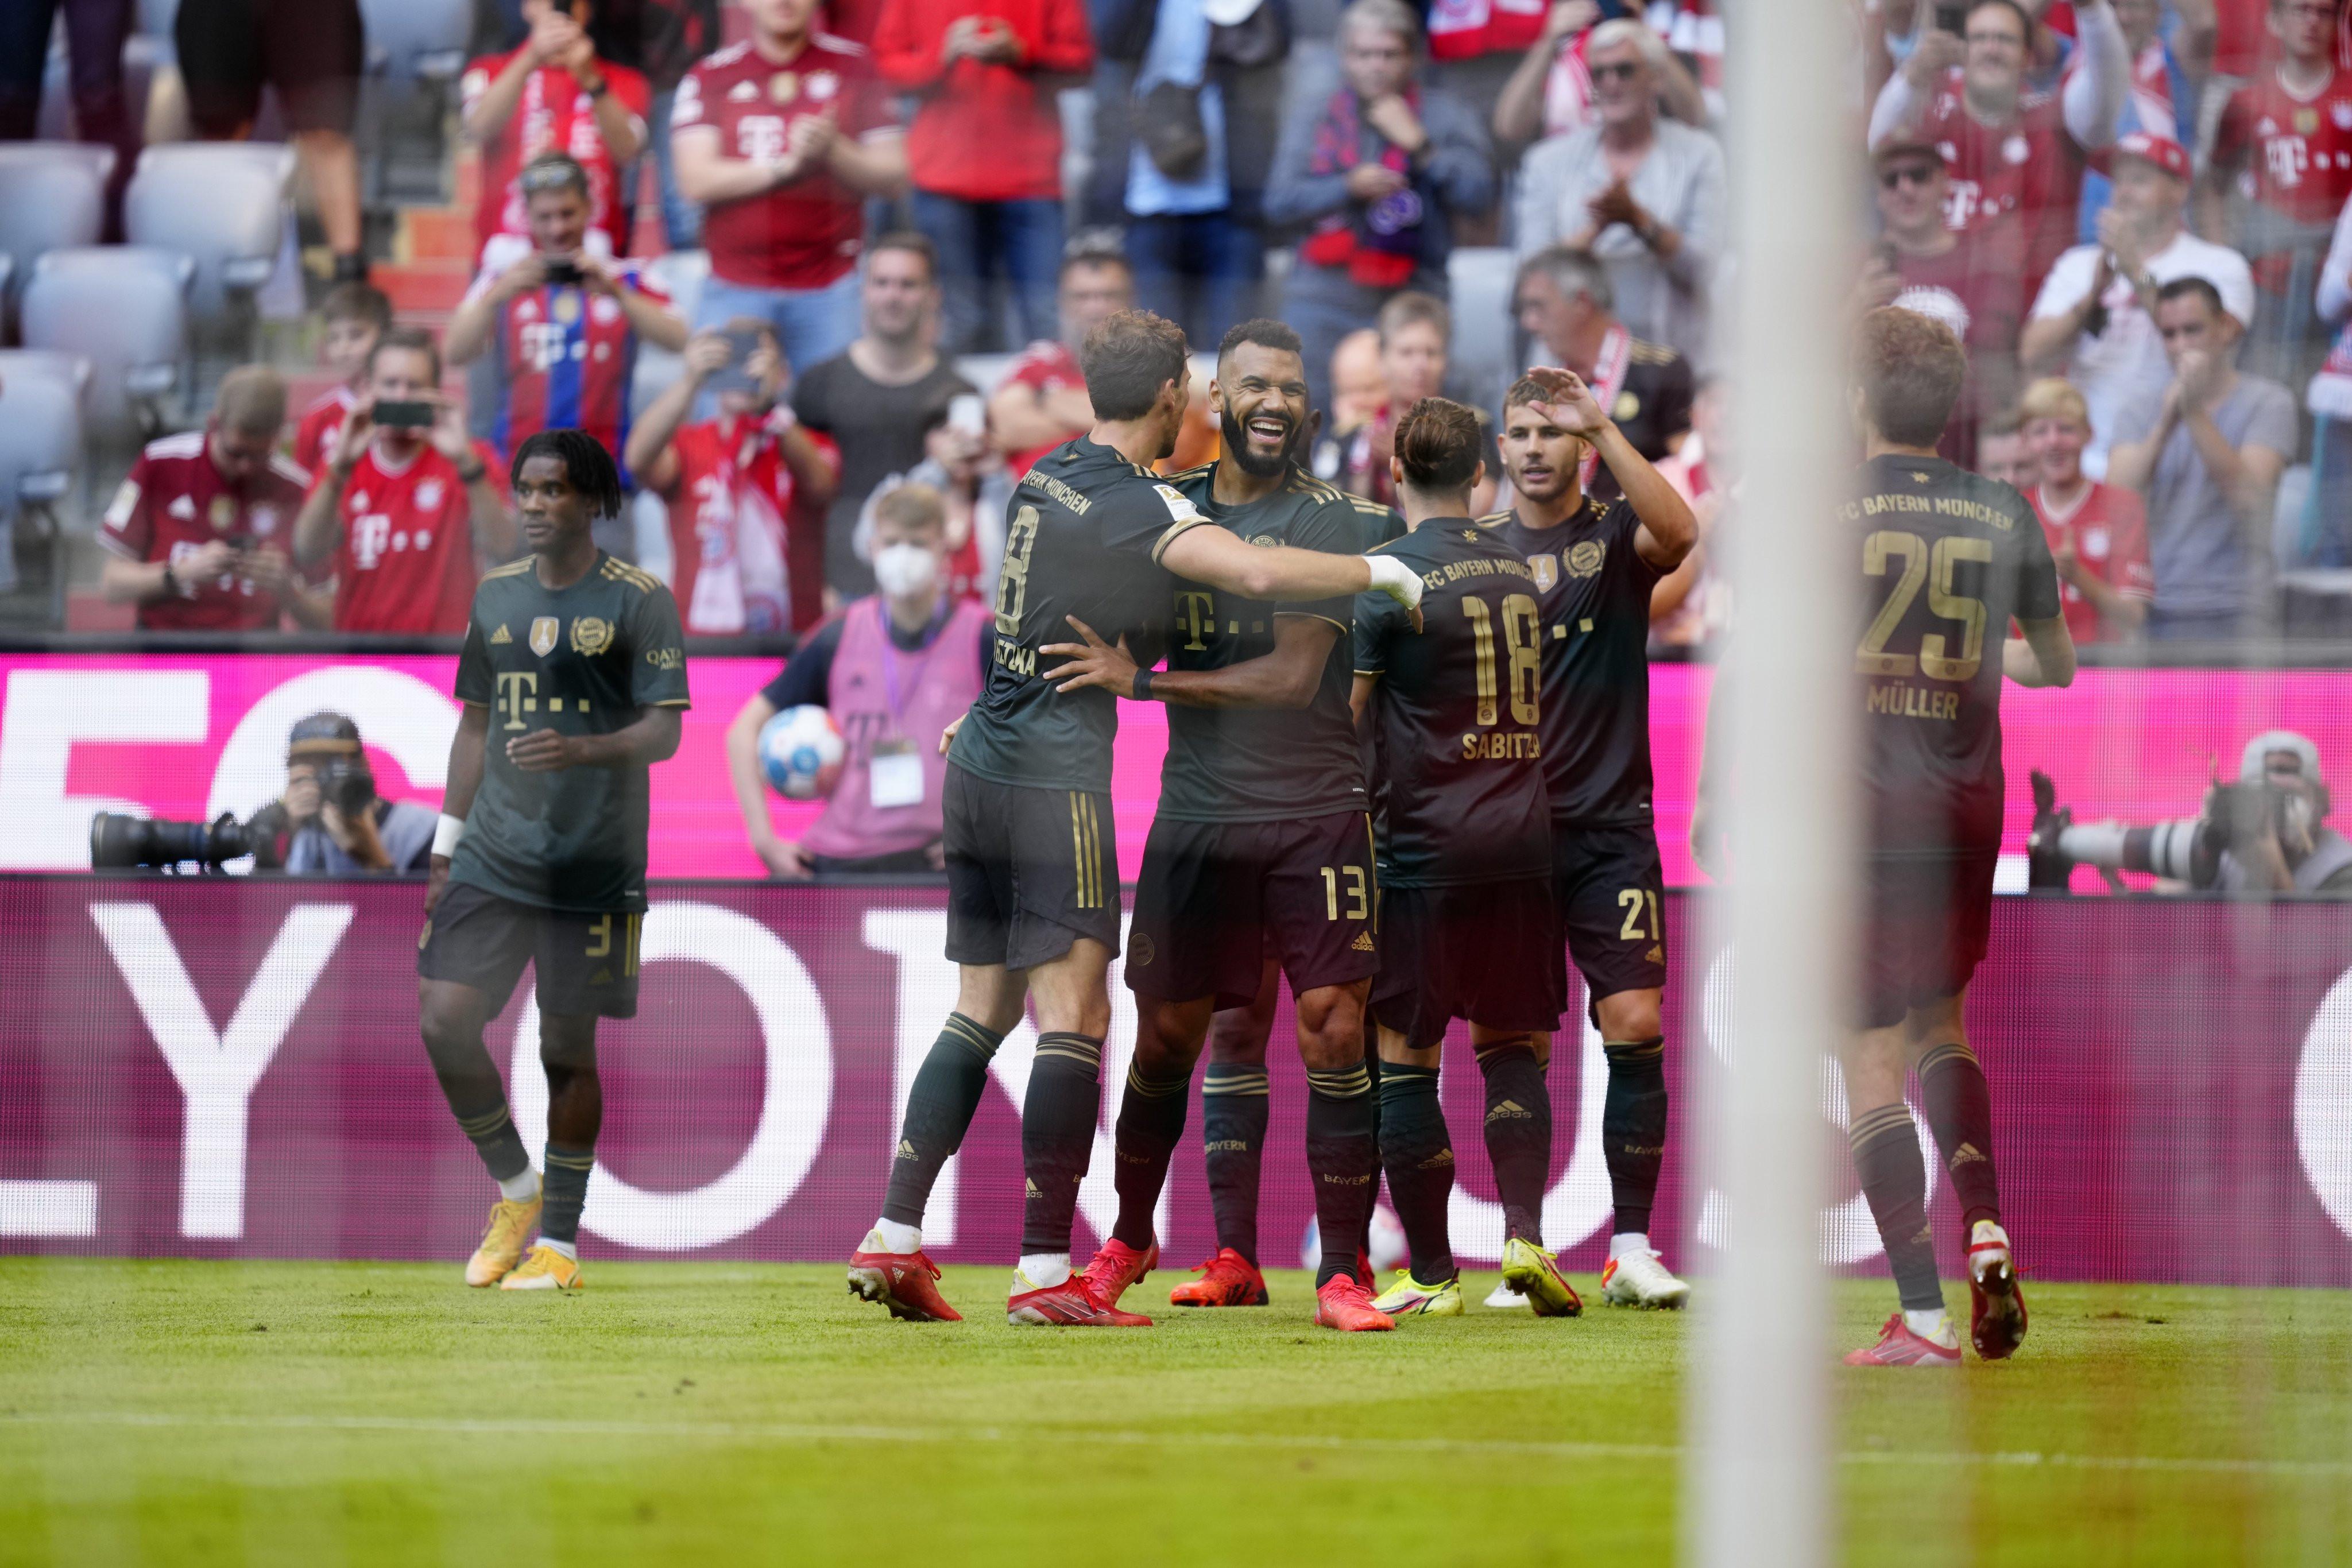 Usai Bantai Barcelona, Bayern Munchen Gilas Vfl Bochum, Lima Pemain Masuk Papan Skor - JPNN.com